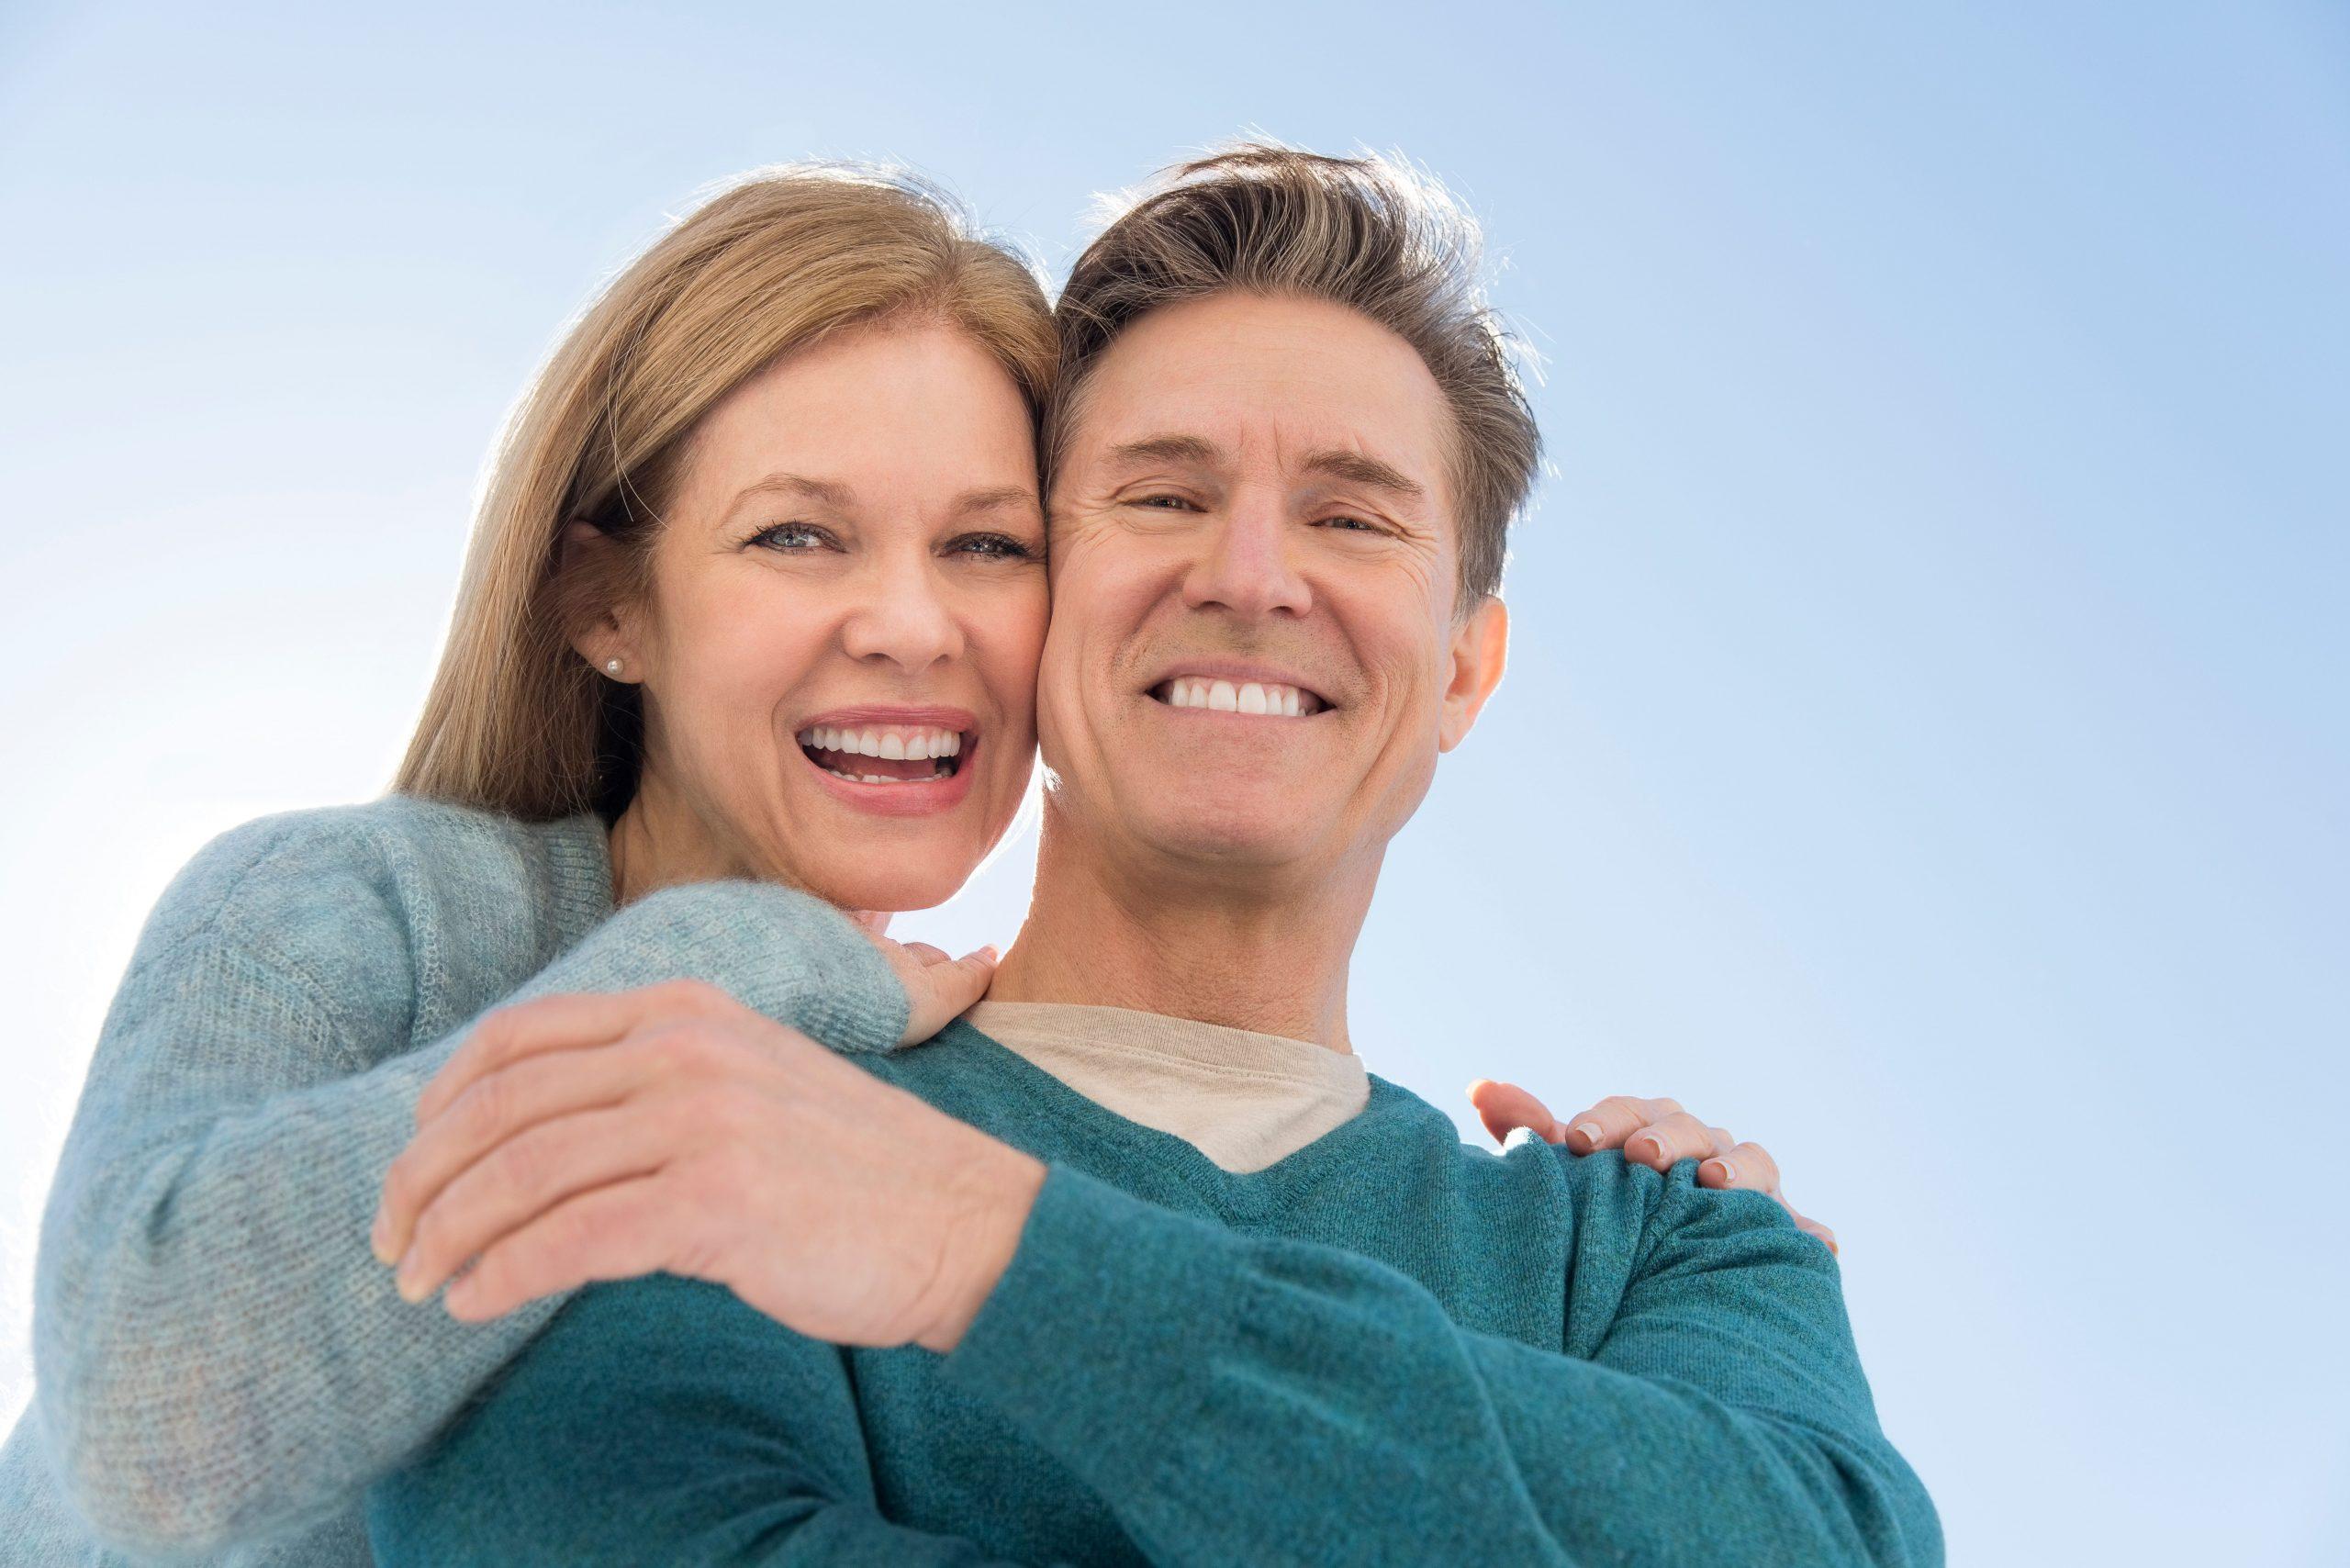 Dentist in Newnan GA | Providing Relief from Periodontal Disease